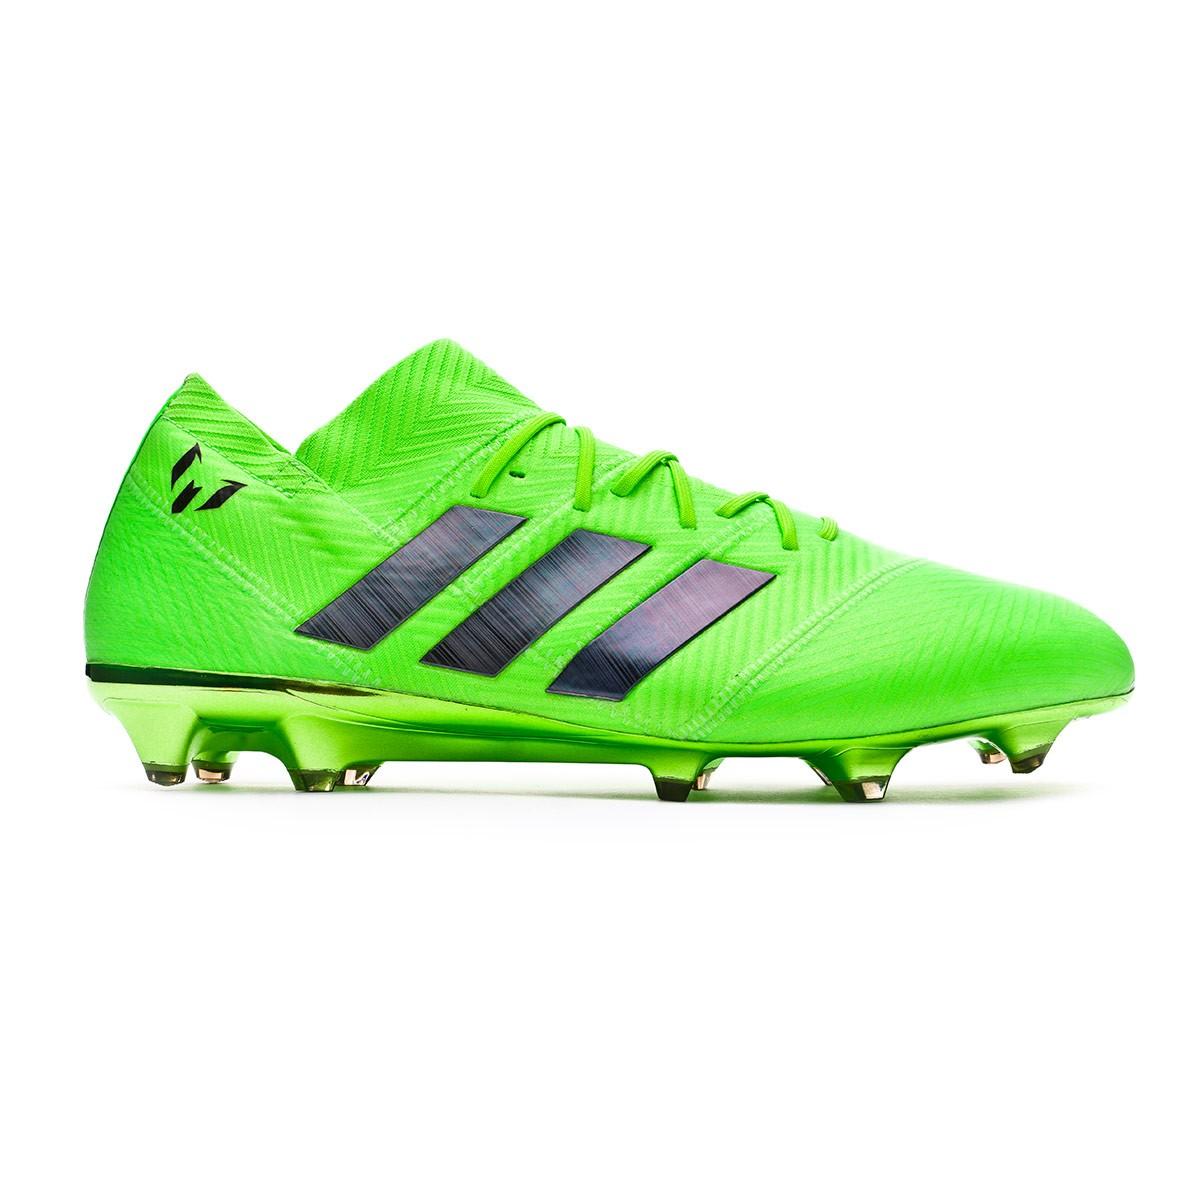 Nemeziz Green Adidas Fg Messi 18 Solar Black Fútbol 1 De Zapatos OPuZiTwXk